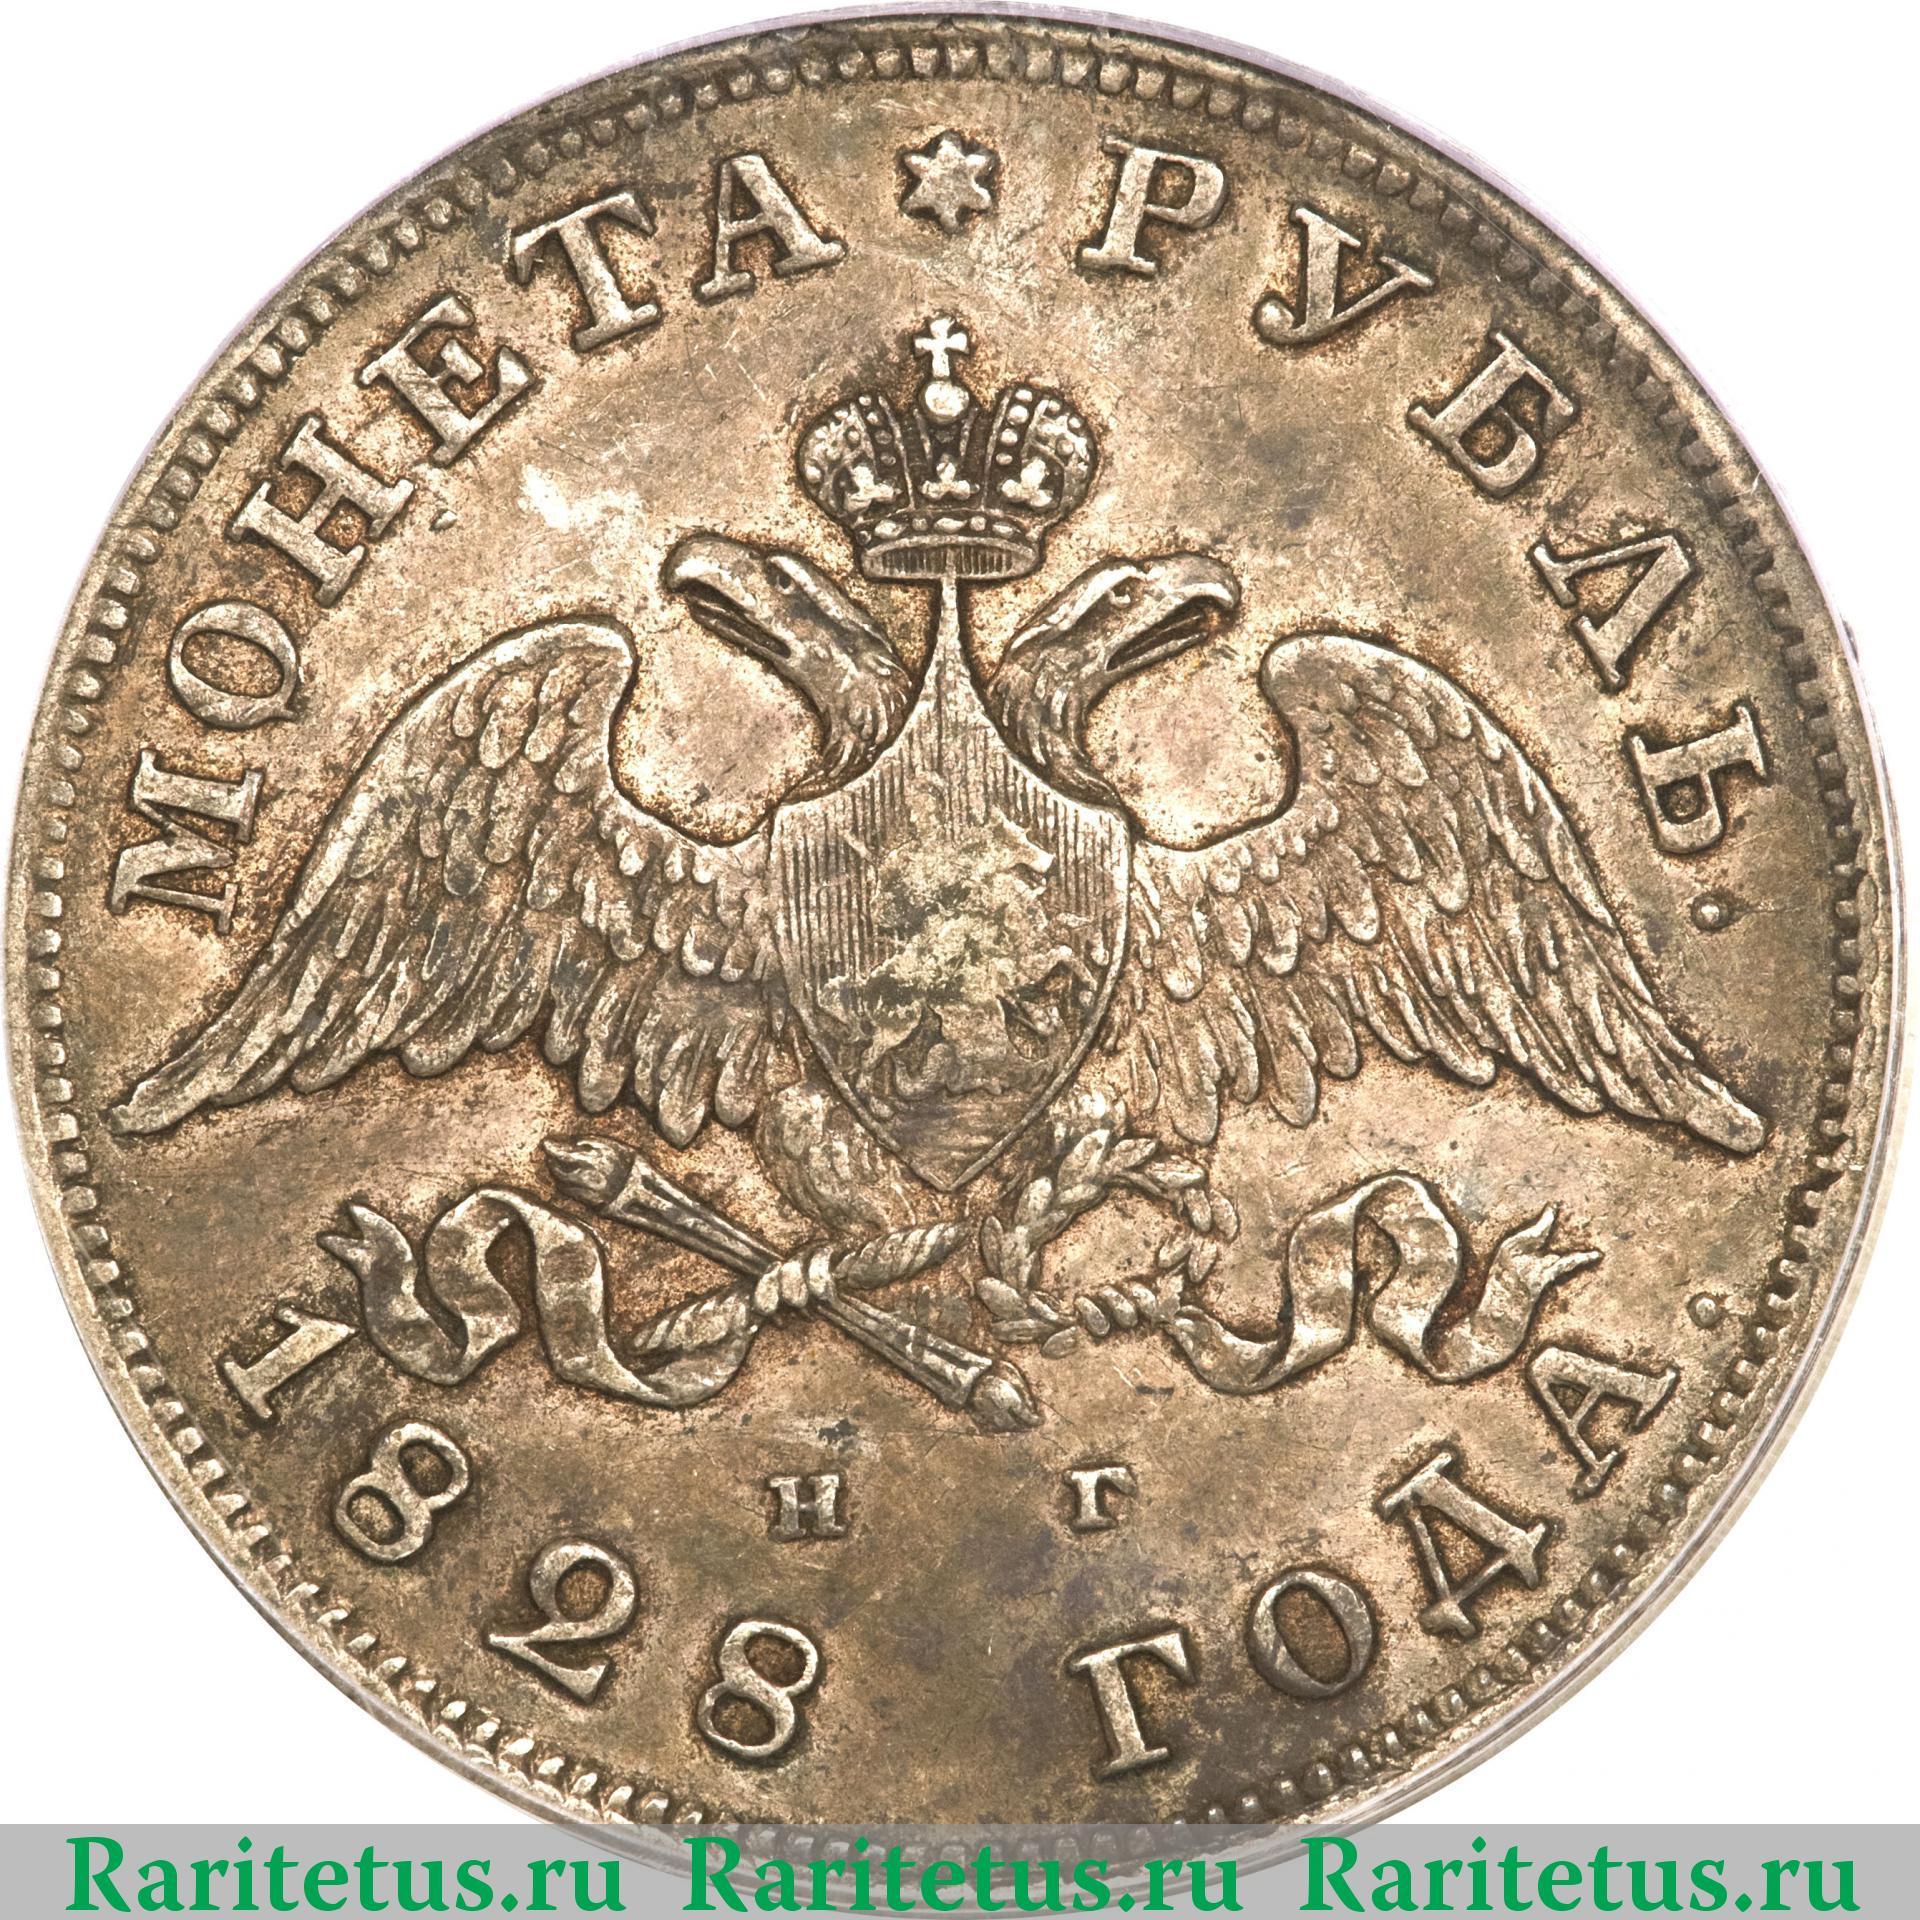 Аверс монеты 1 рубль 1828 года СПБ-НГ